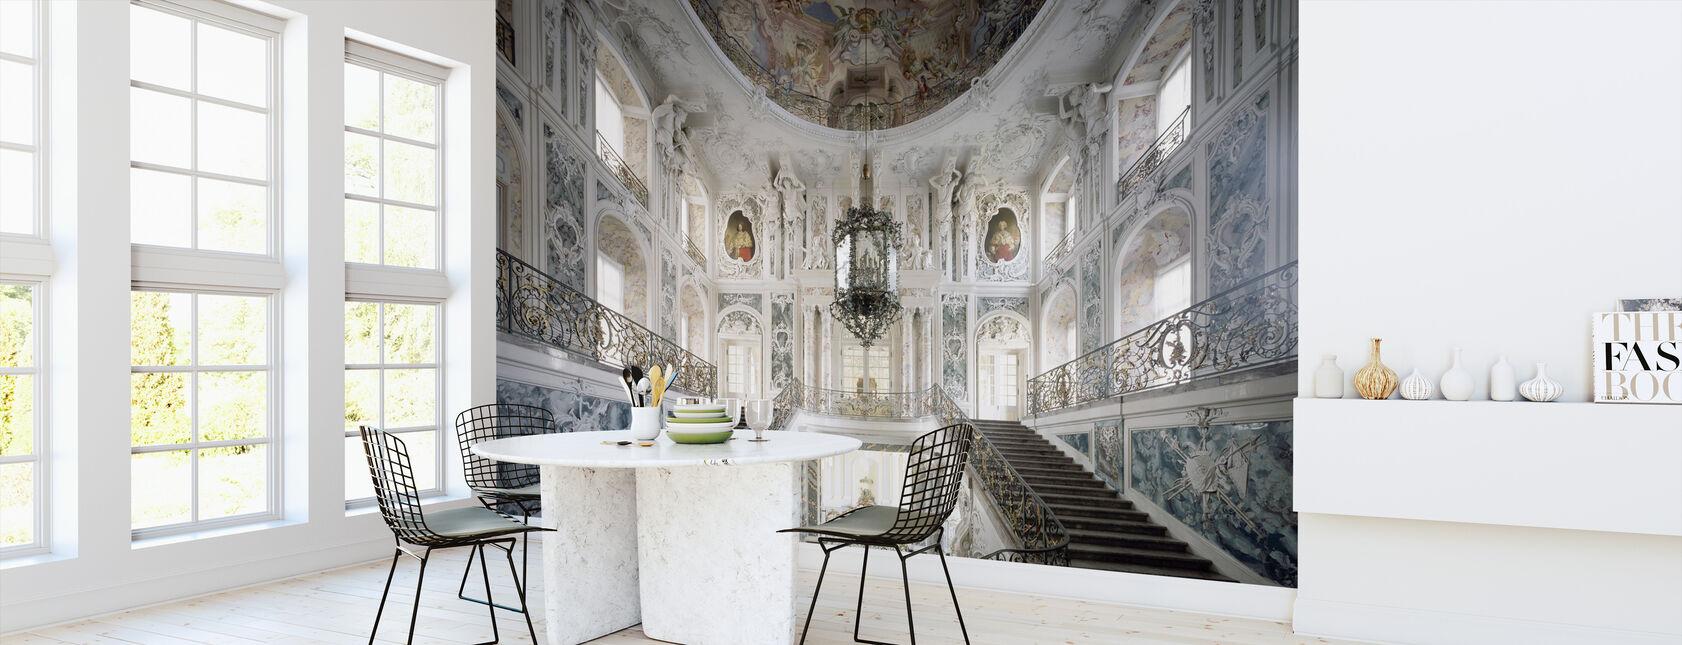 Majestic Stairs - Wallpaper - Kitchen